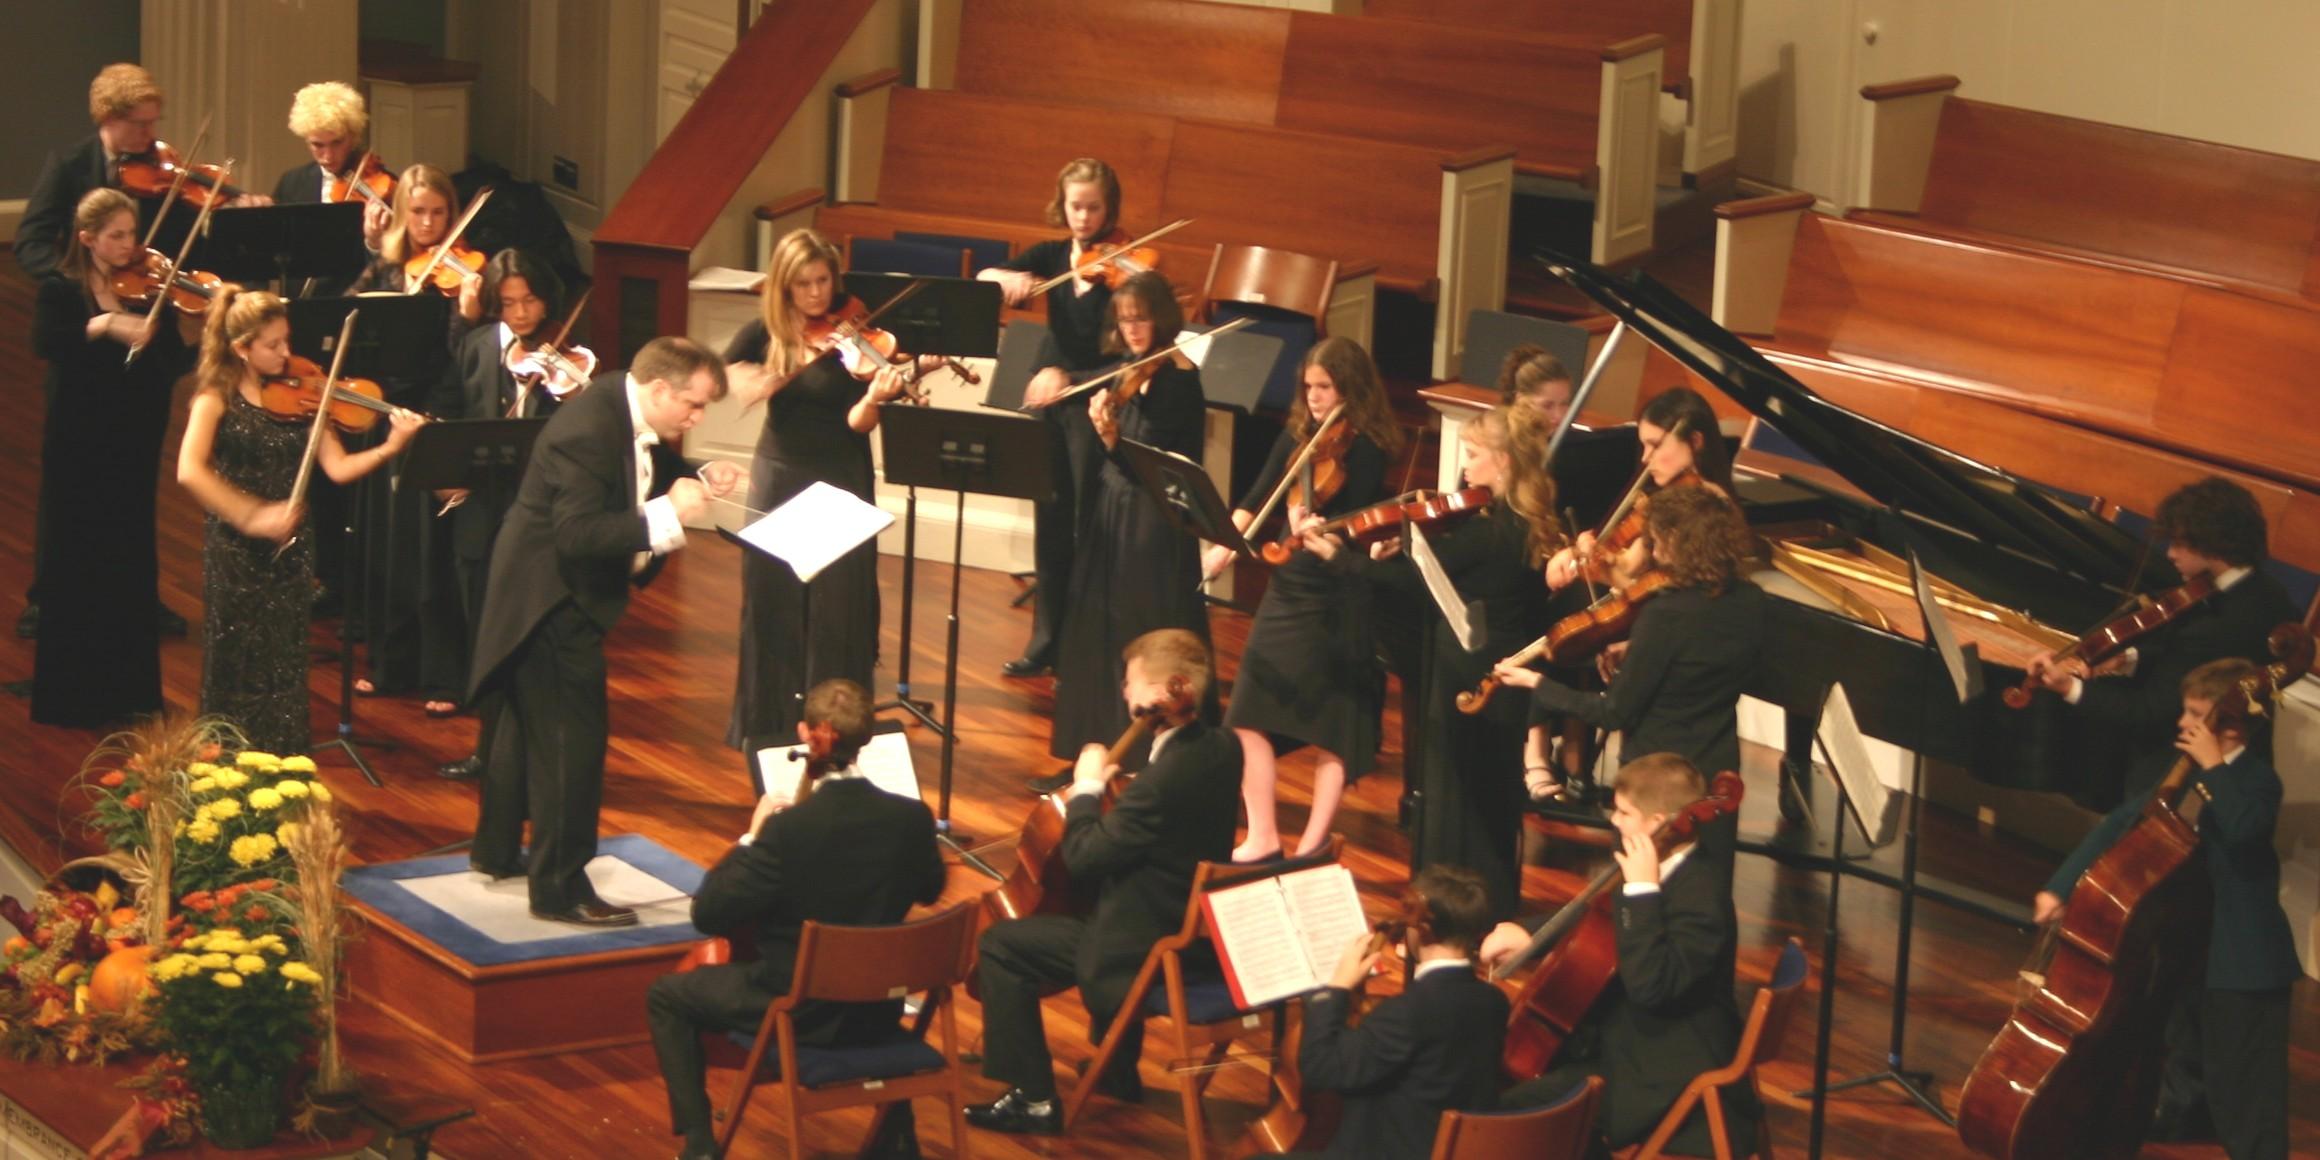 The original Baroque Festival Orchestra